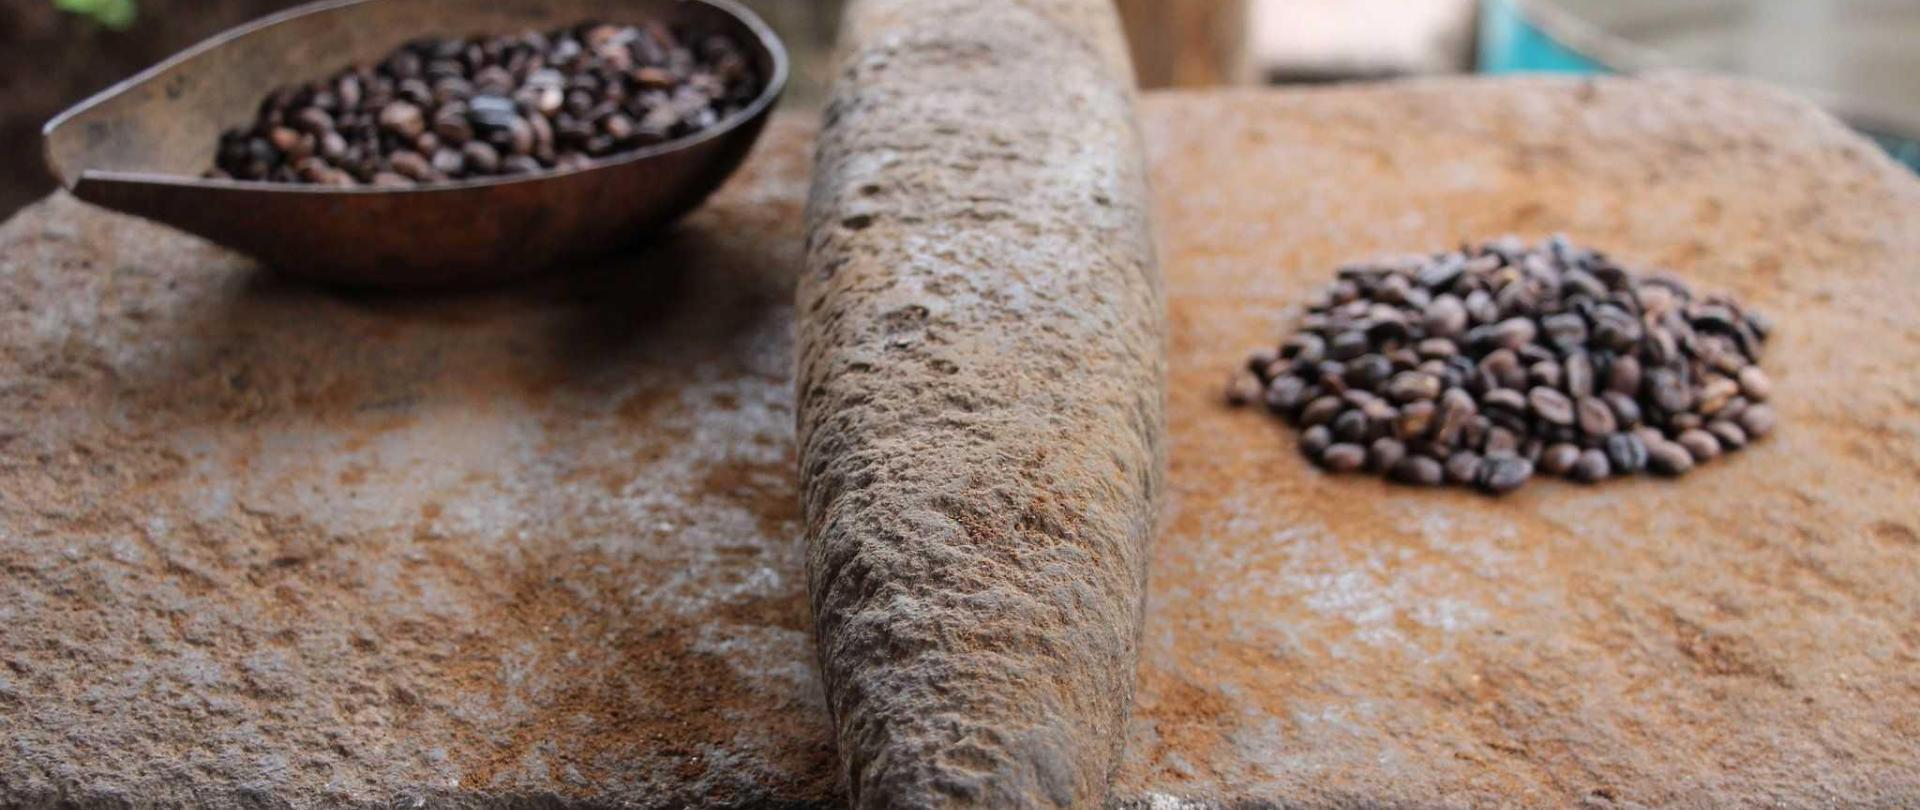 piedra-de-moler-cafe-2.JPG